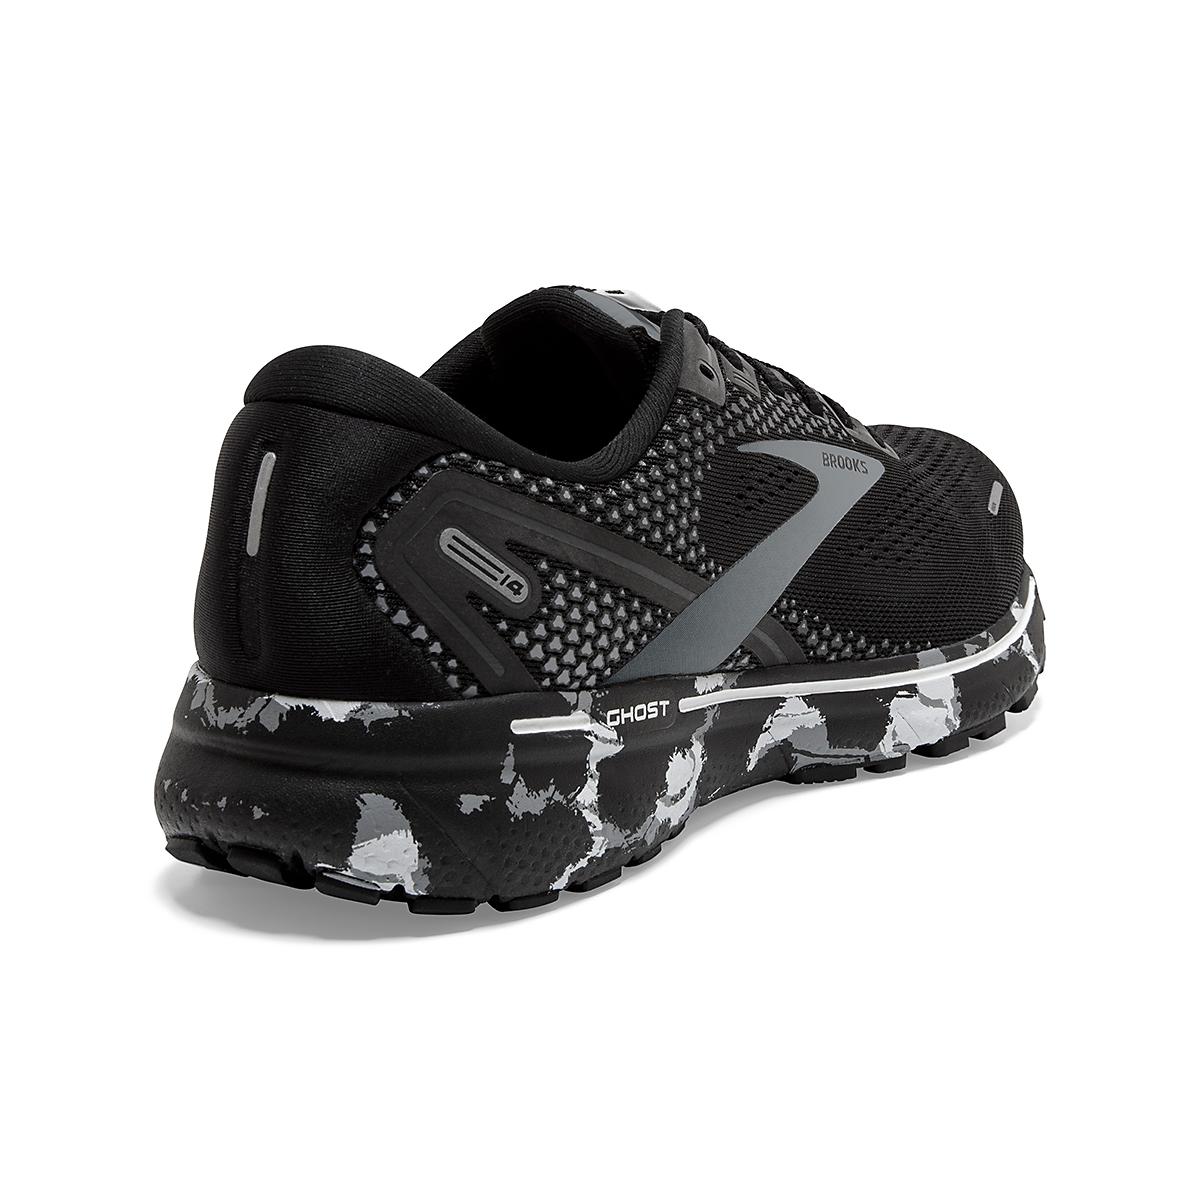 Men's Brooks Ghost 14 Running Shoe - Color: Black/Grey/White - Size: 7 - Width: Regular, Black/Grey/White, large, image 3